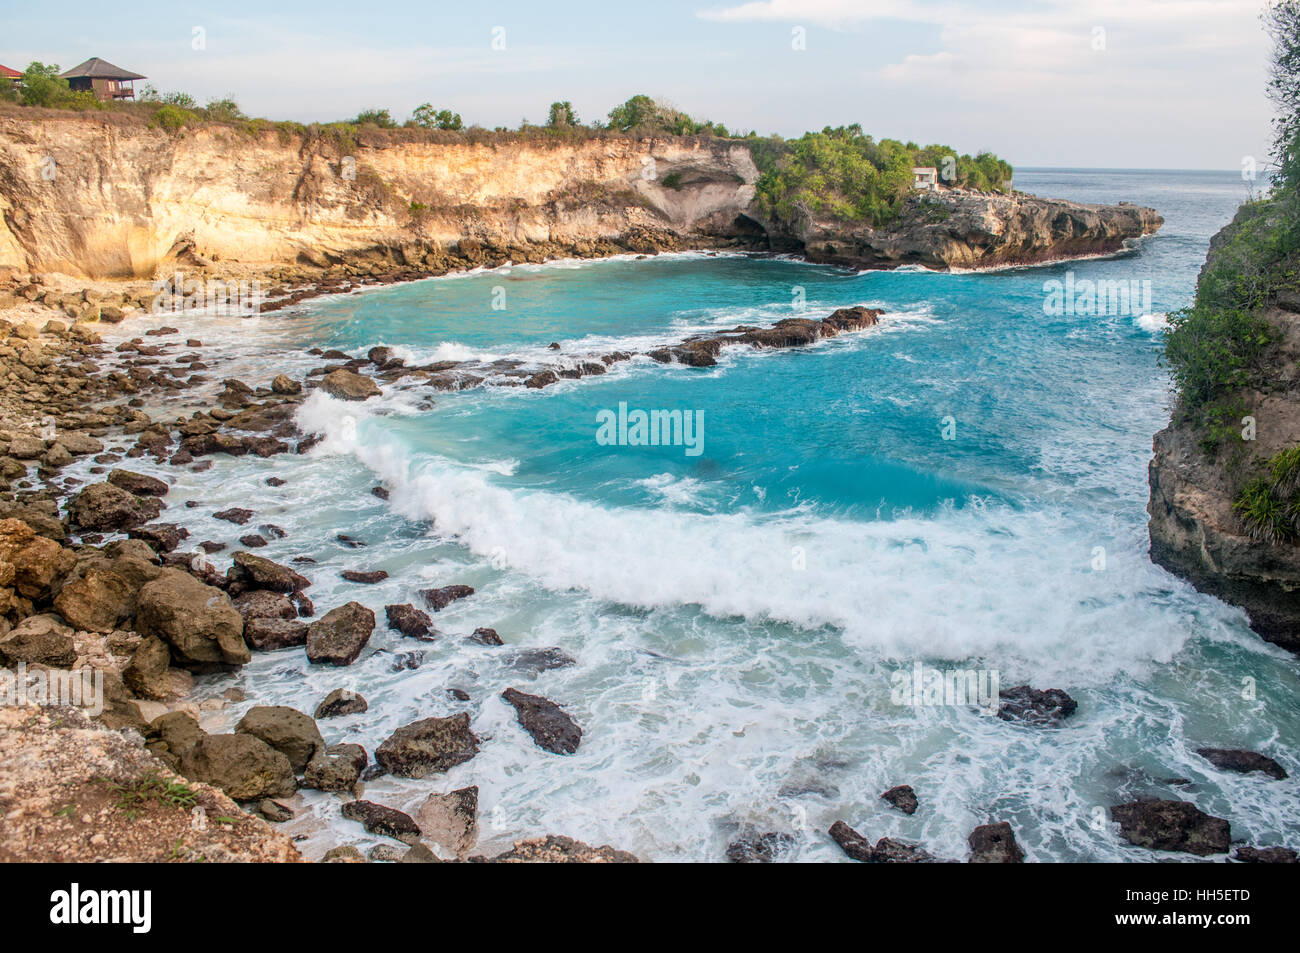 blue lagoon nusa ceningan bali indonesia stock photo. Black Bedroom Furniture Sets. Home Design Ideas